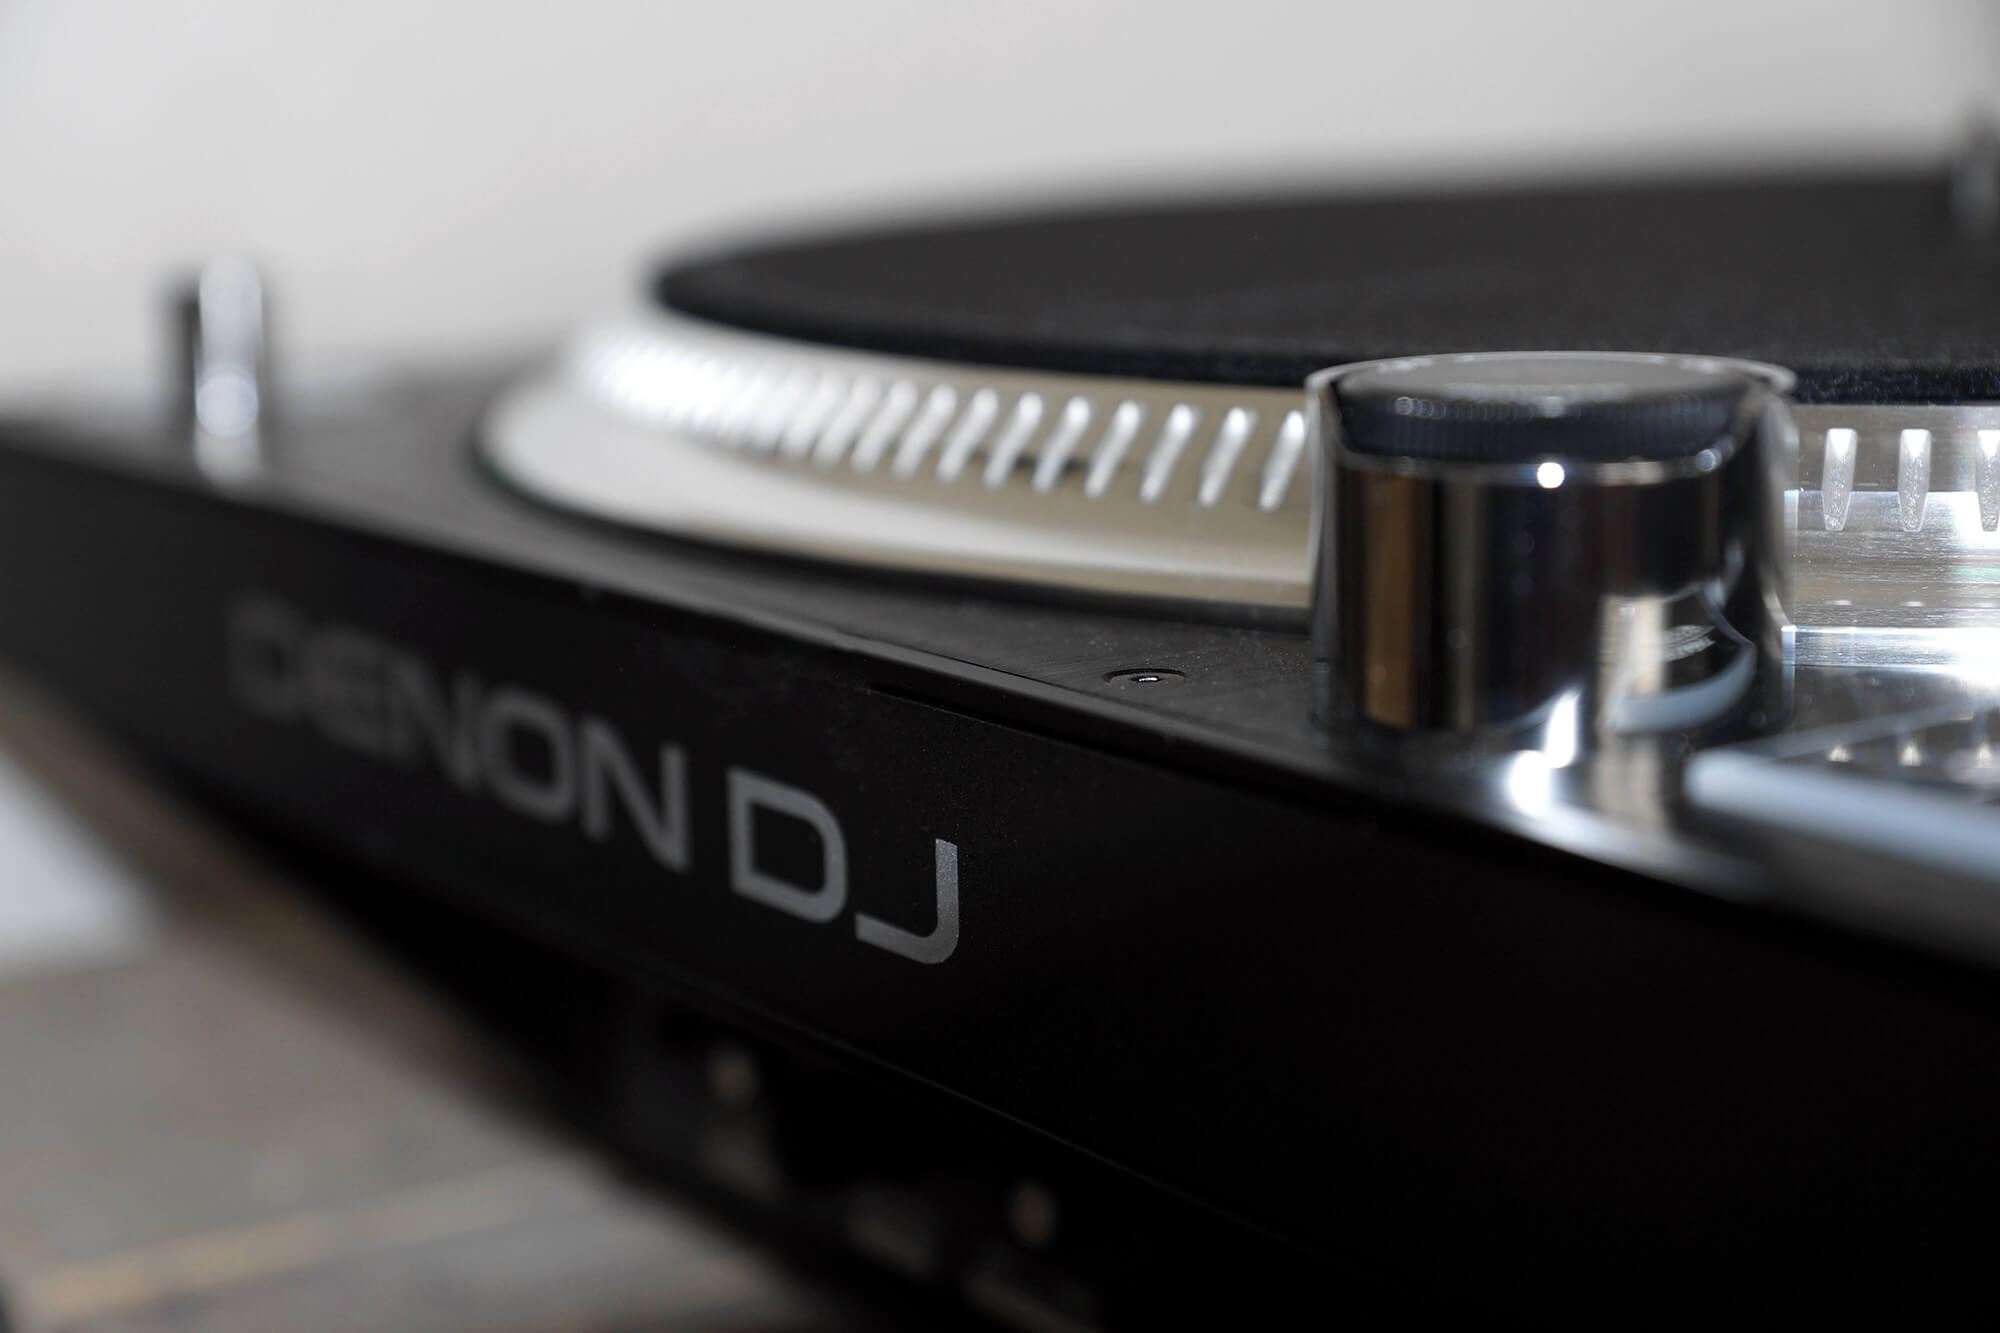 Sonos Vinyl: Denon DJ VL12 Prime Test 6 techboys.de • smarte News, auf den Punkt! Sonos Vinyl: Denon DJ VL12 Prime Test